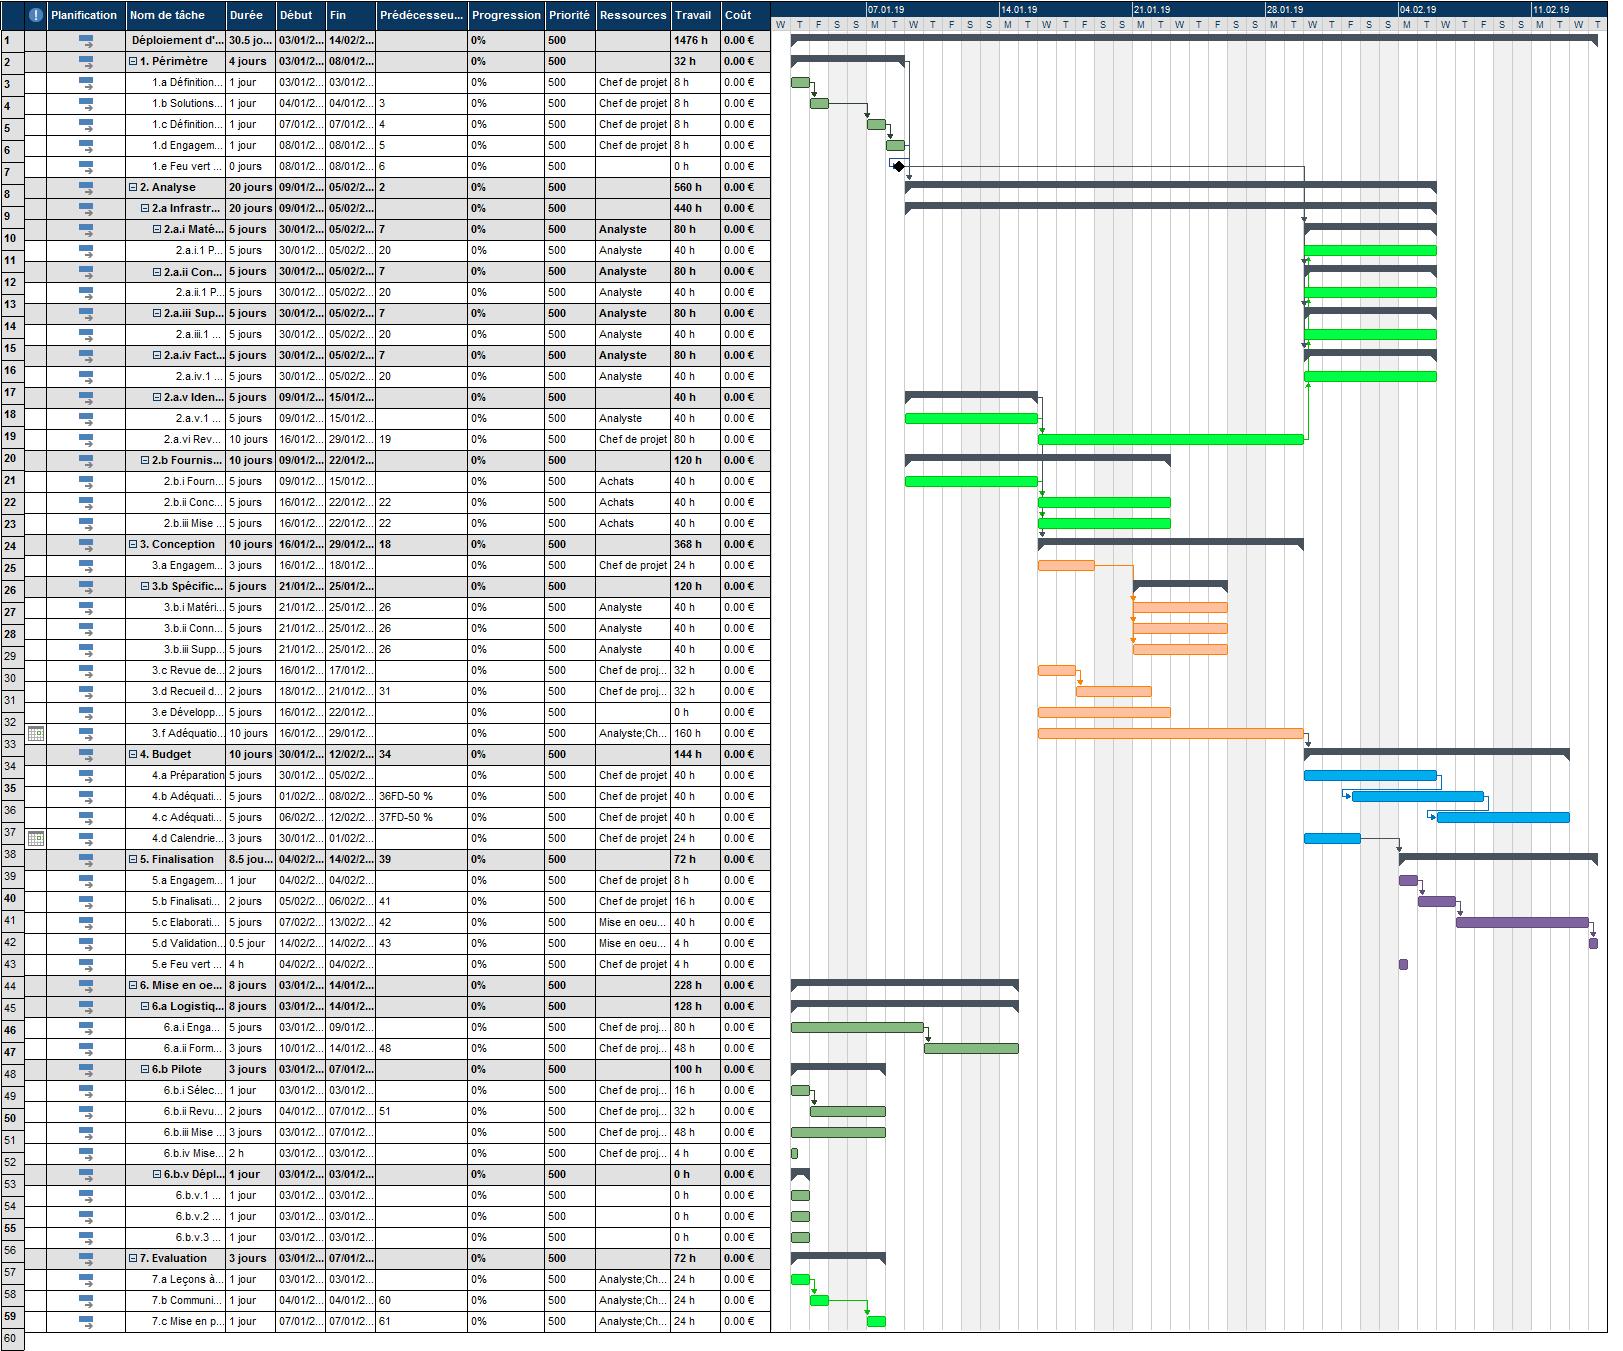 9 uml diagrams for library management system 1994 club car 36 volt wiring diagram download gantt chart online